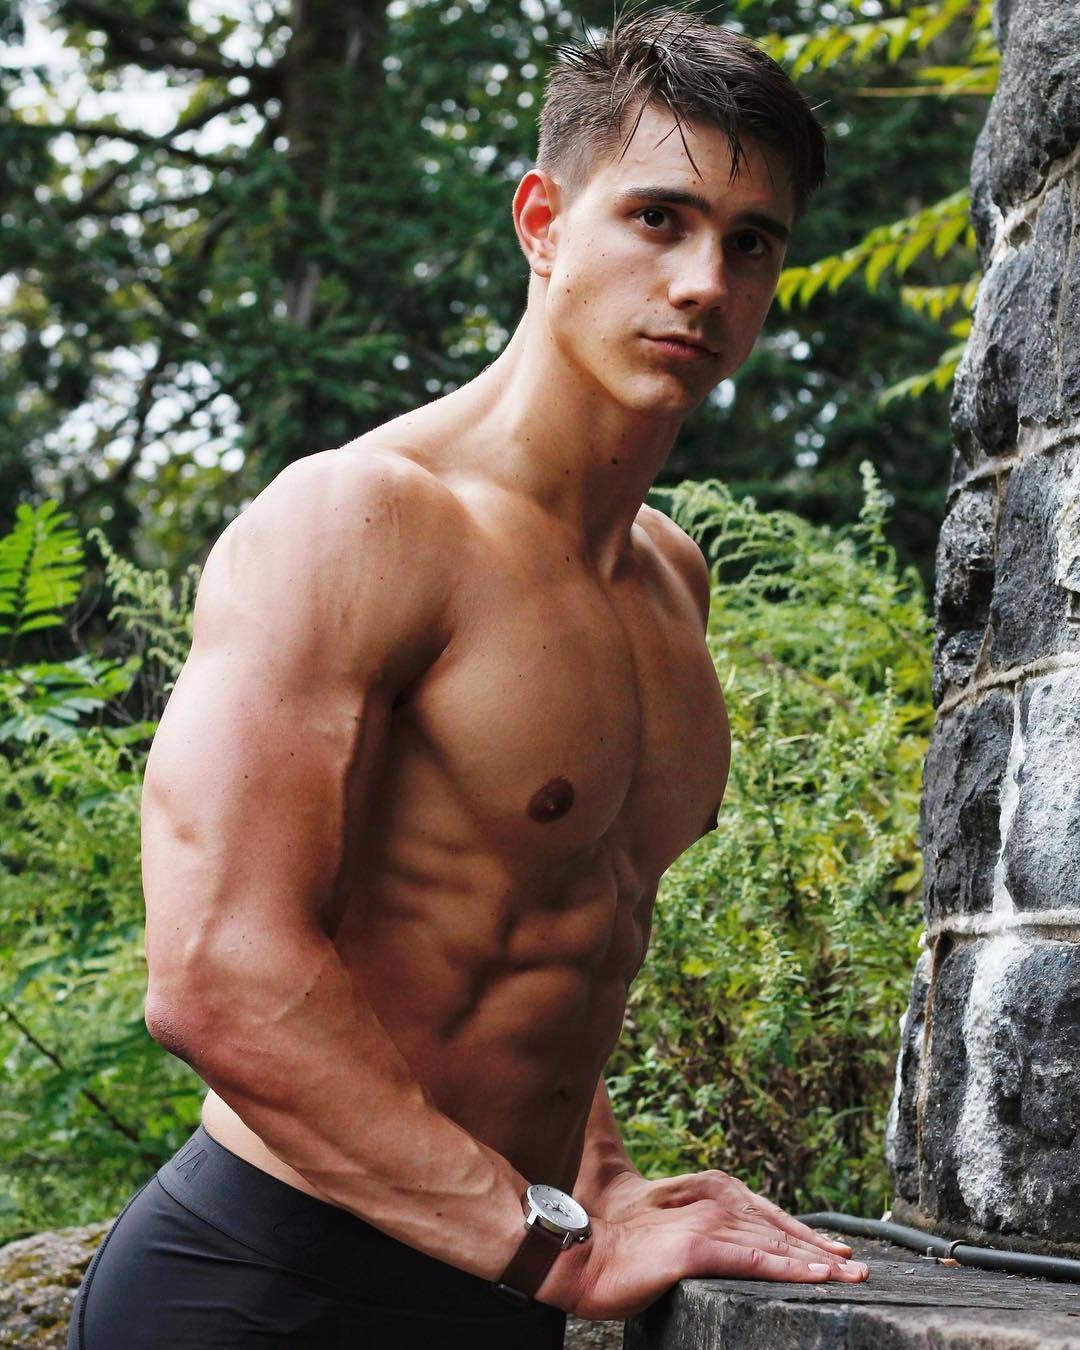 muscular-shirtless-guy-perky-nipples-big-pecs-abs-veiny-biceps